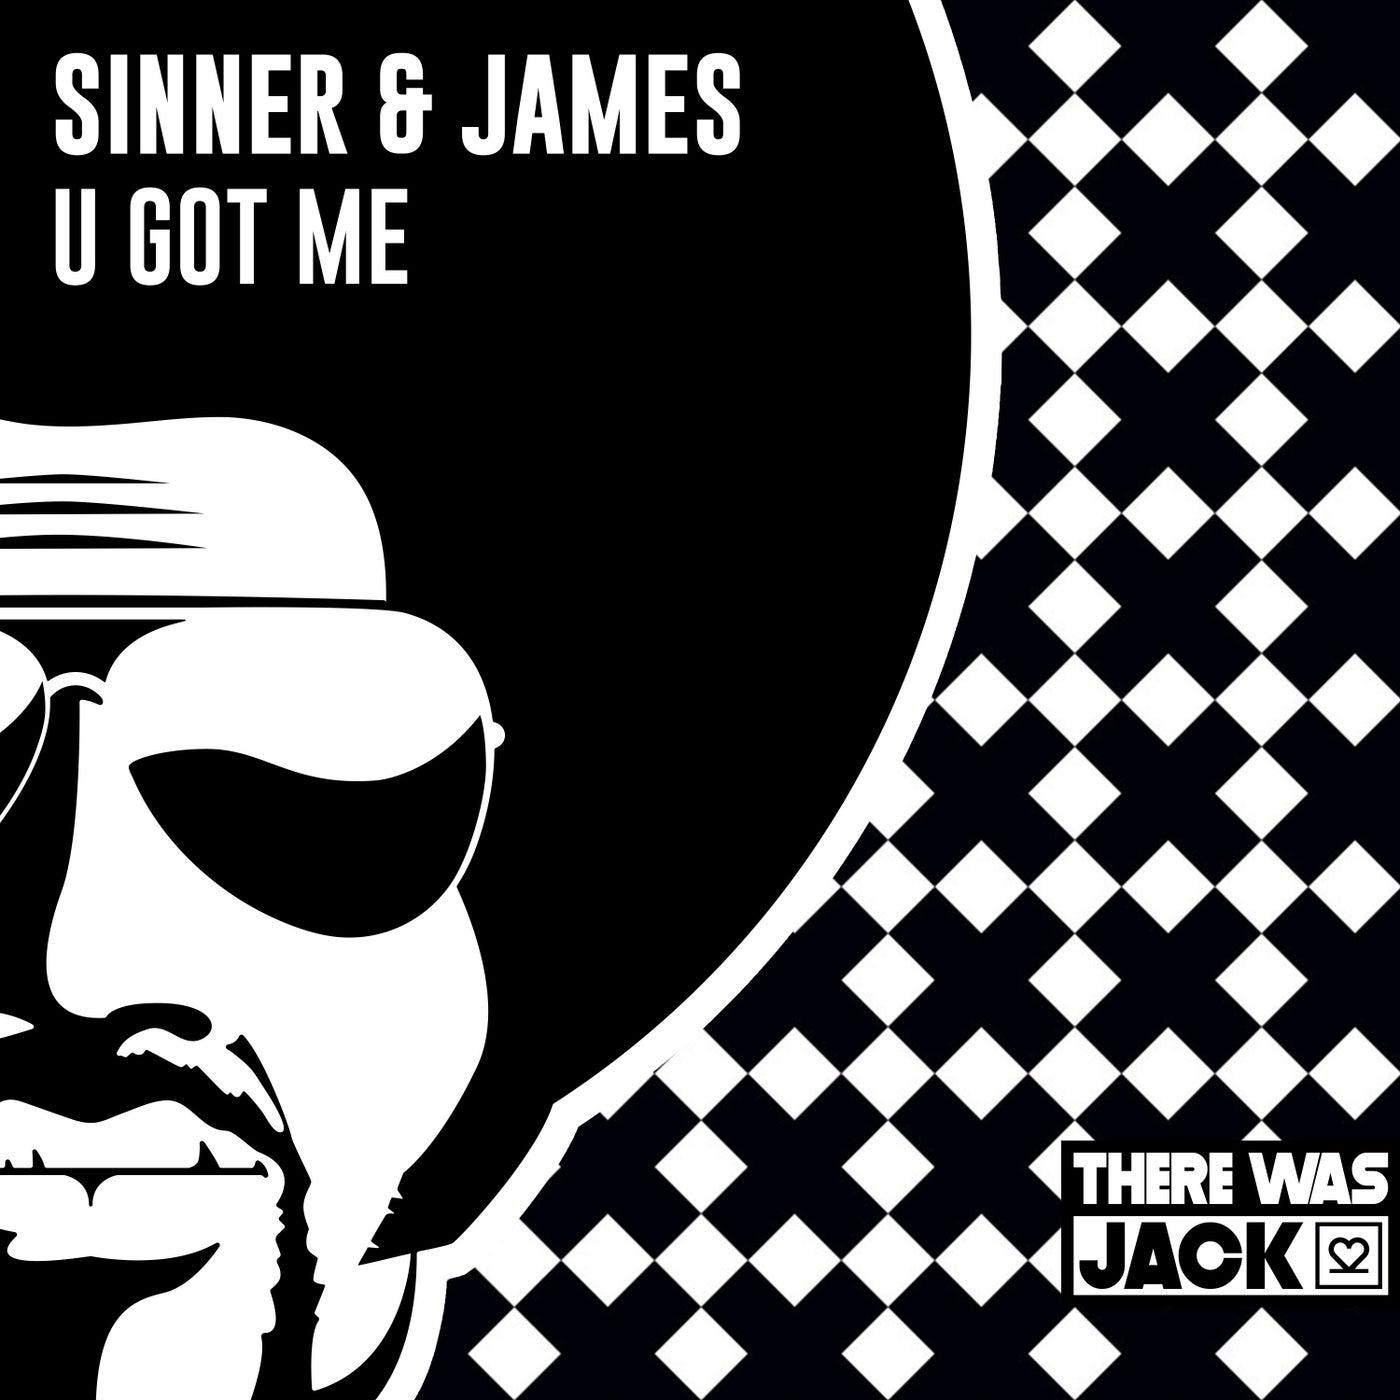 U Got Me (Original Mix)